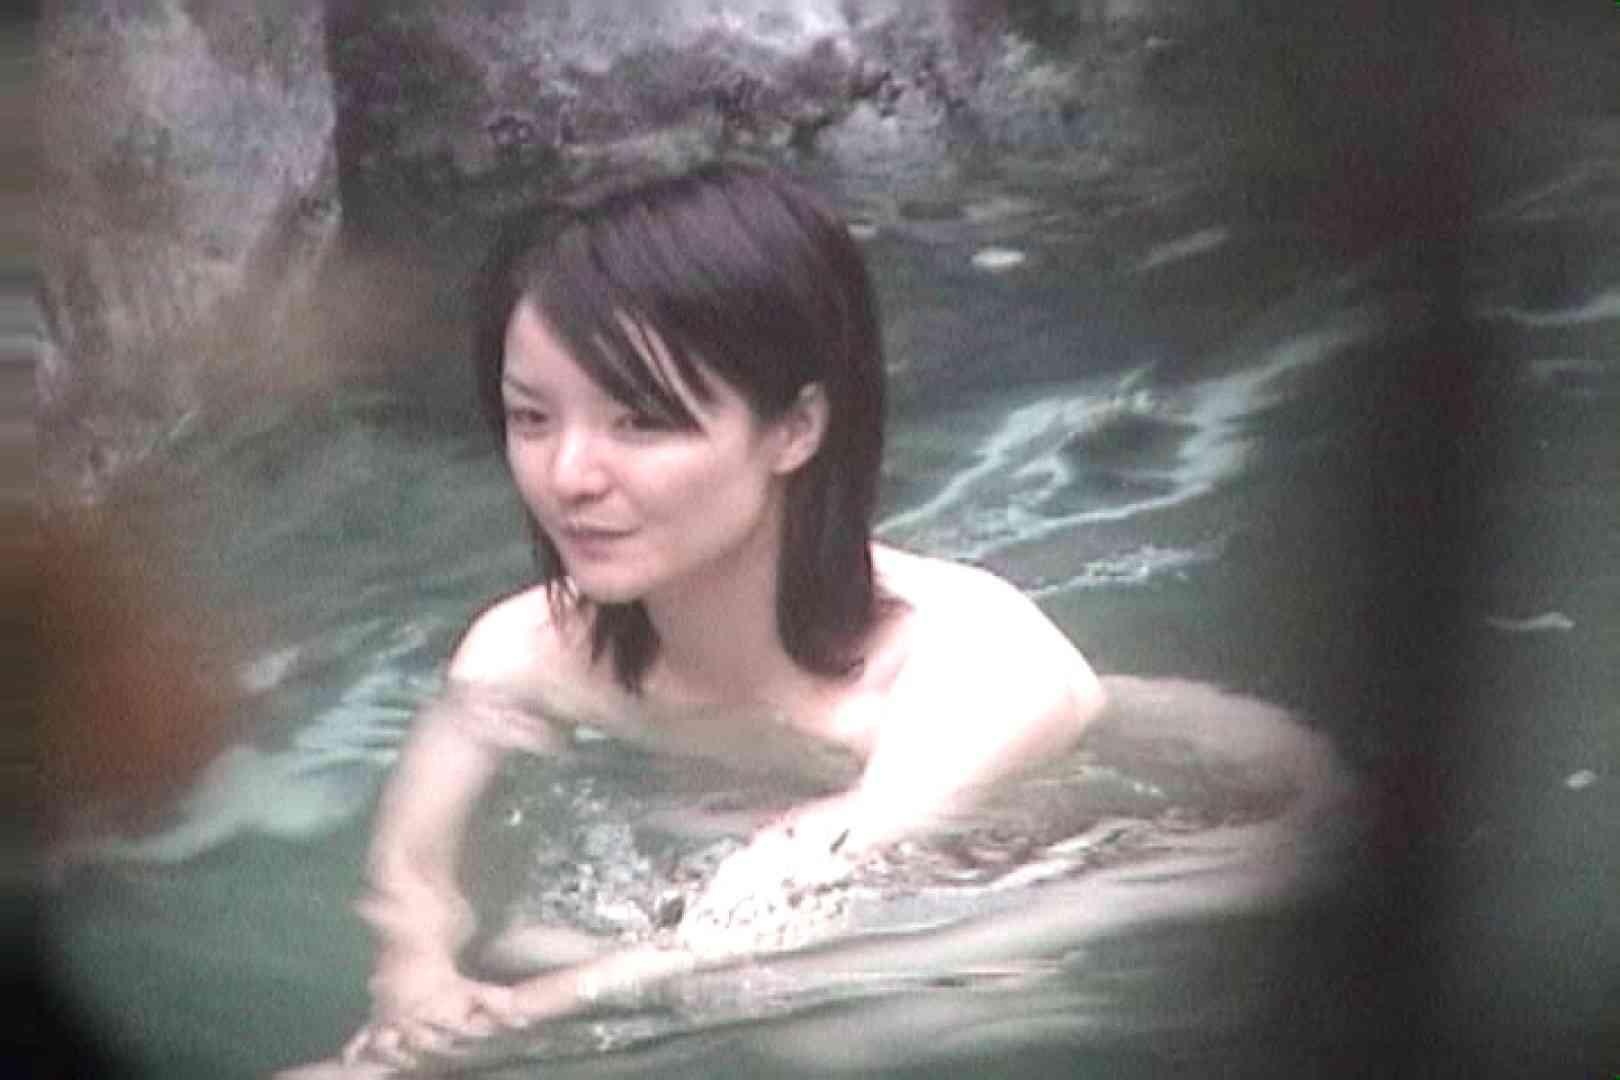 Aquaな露天風呂Vol.71【VIP限定】 露天 | OLセックス  107画像 70